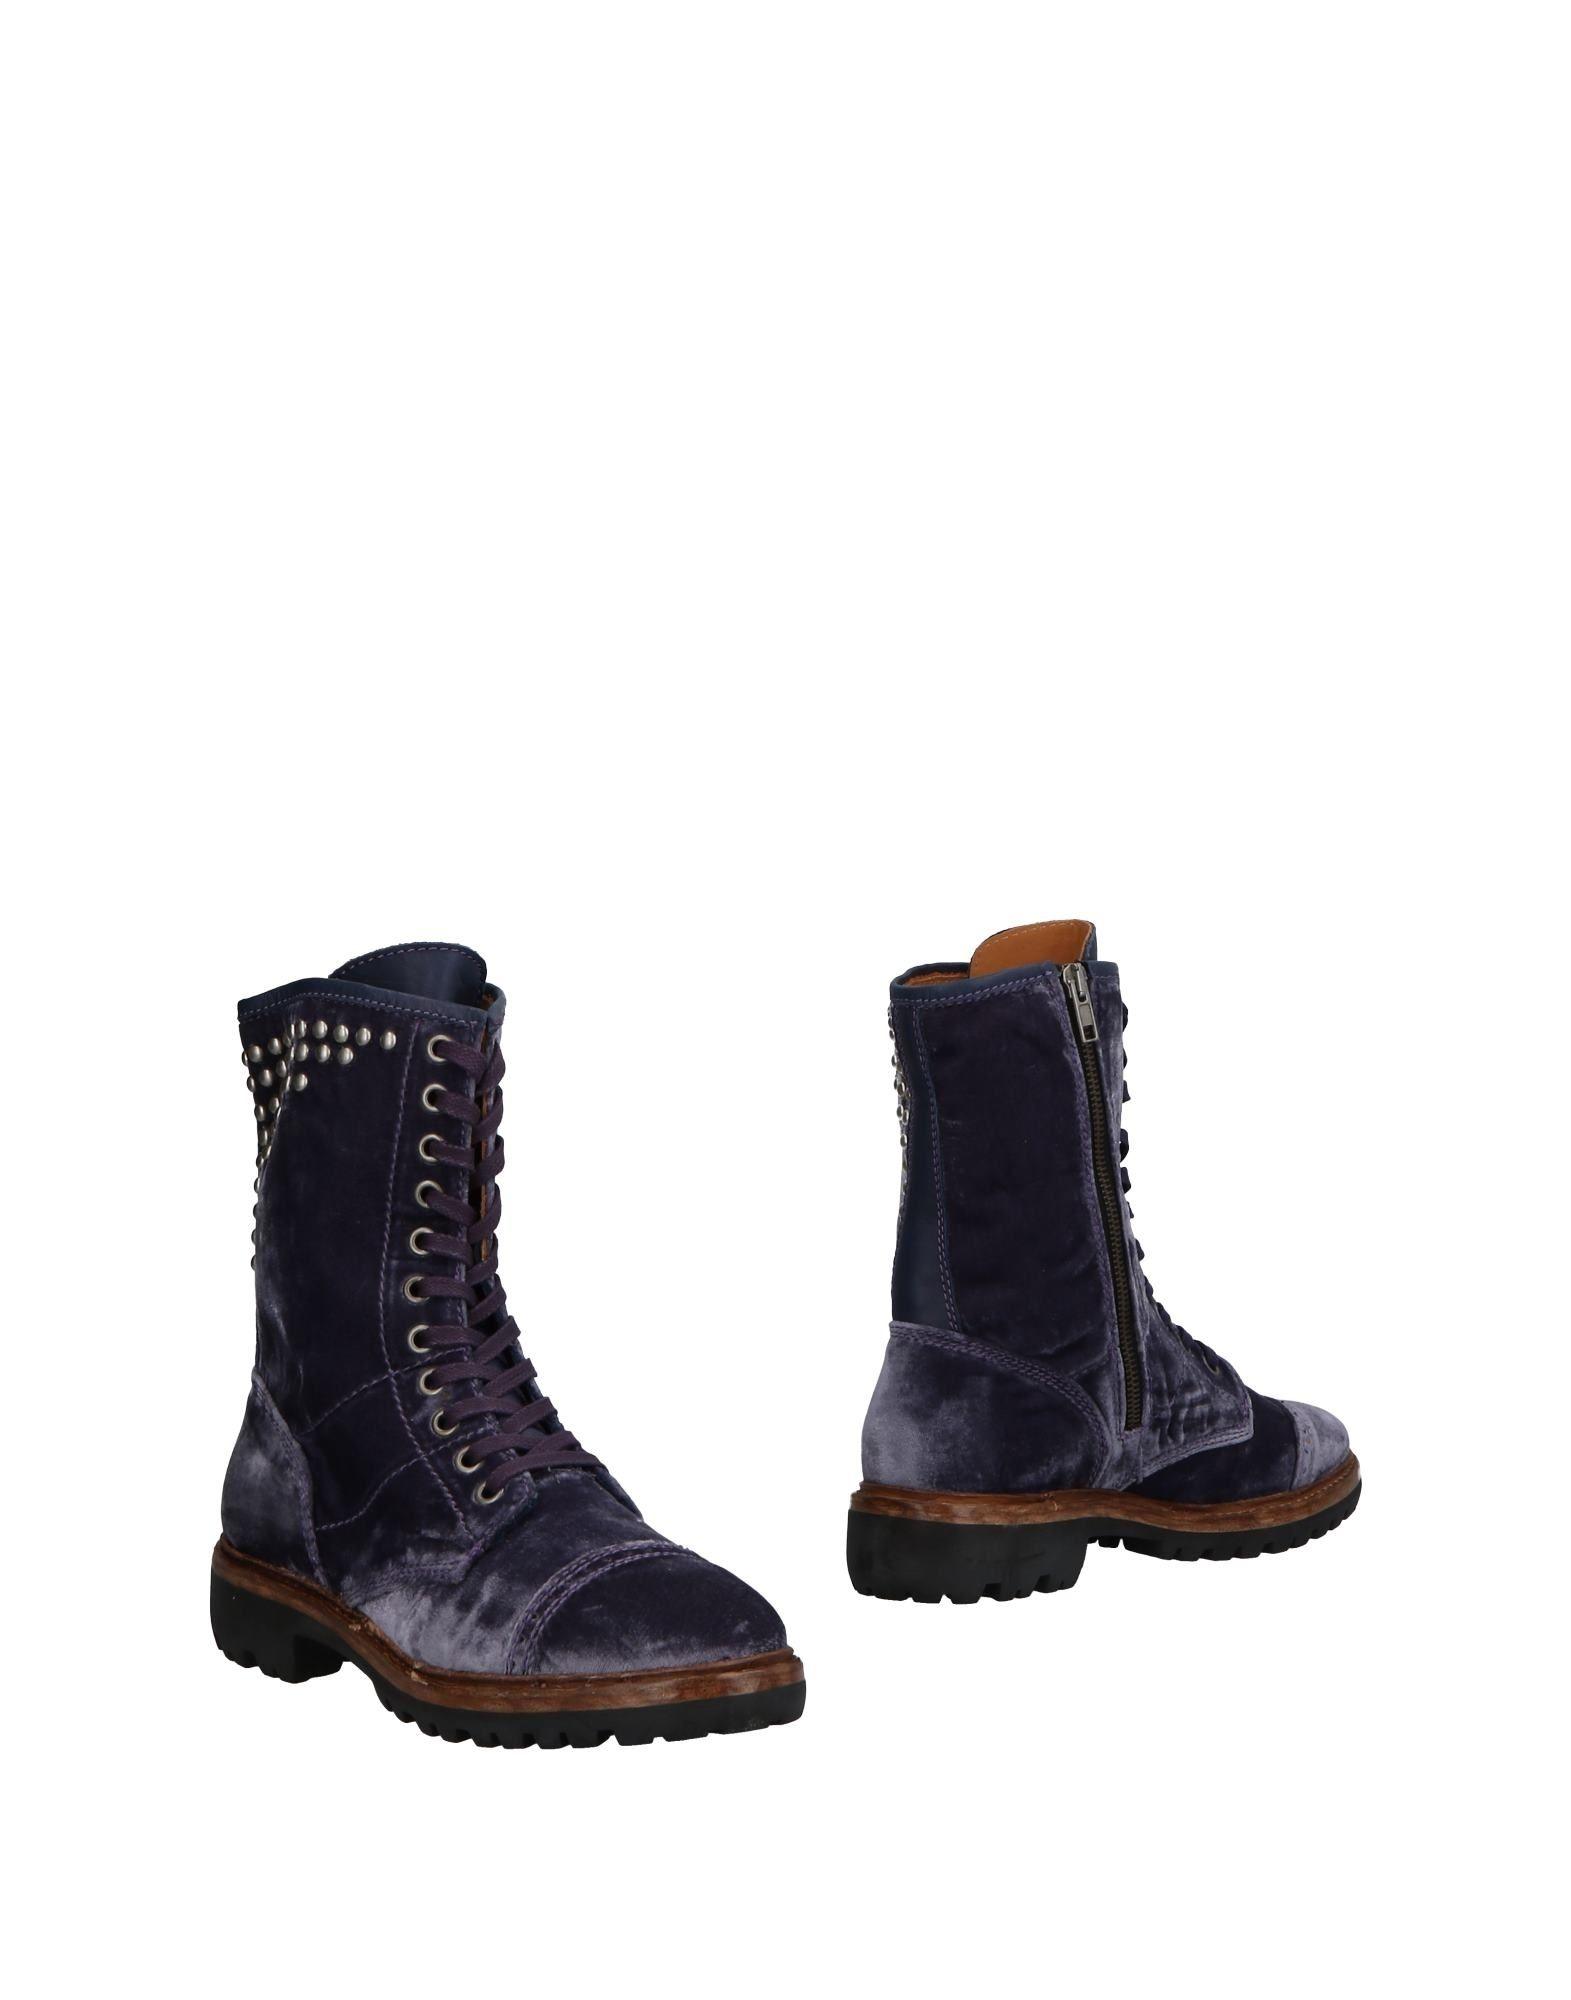 Catarina Martins Ankle Boot - Women Catarina Catarina Women Martins Ankle Boots online on  United Kingdom - 11507158VB 3c1852